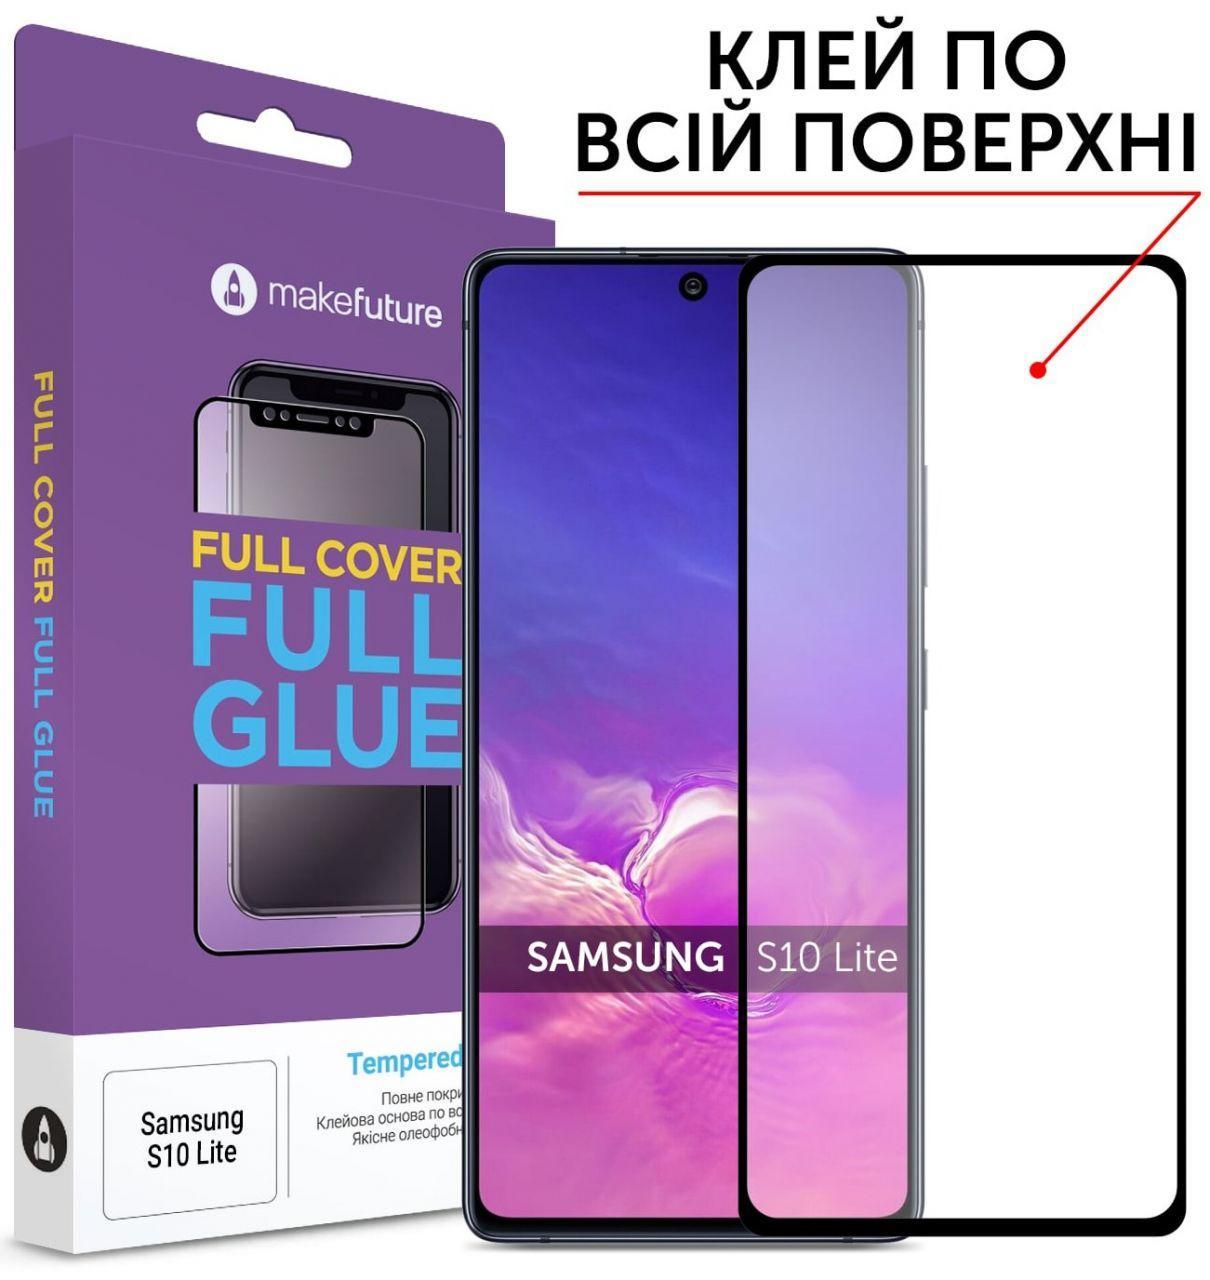 Захисне скло MakeFuture Full Cover Full Glue Samsung G770 Galaxy S10 Lite Black (MGF-SS10L)